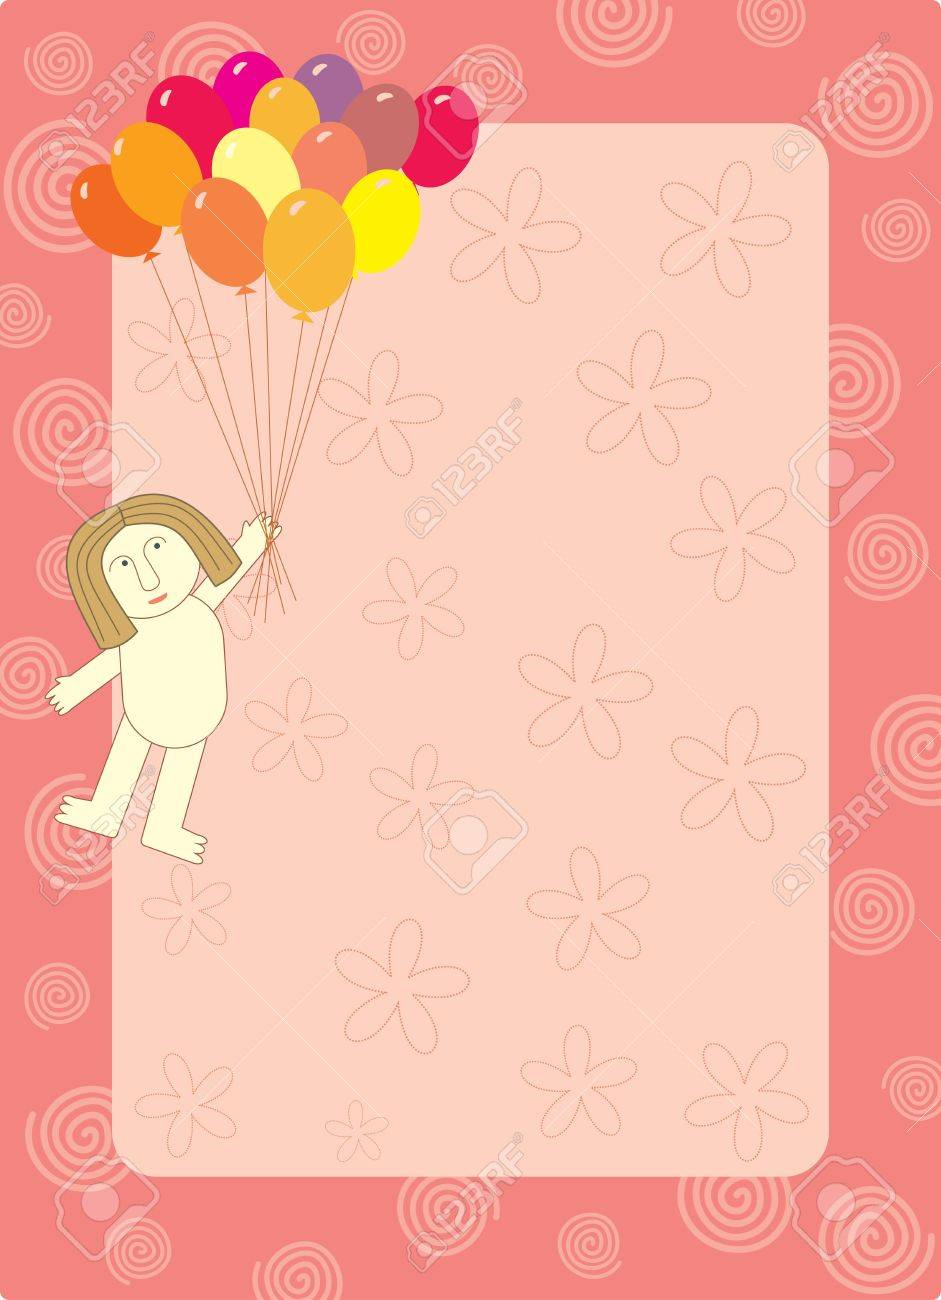 balloon flying man frame Stock Vector - 14130622